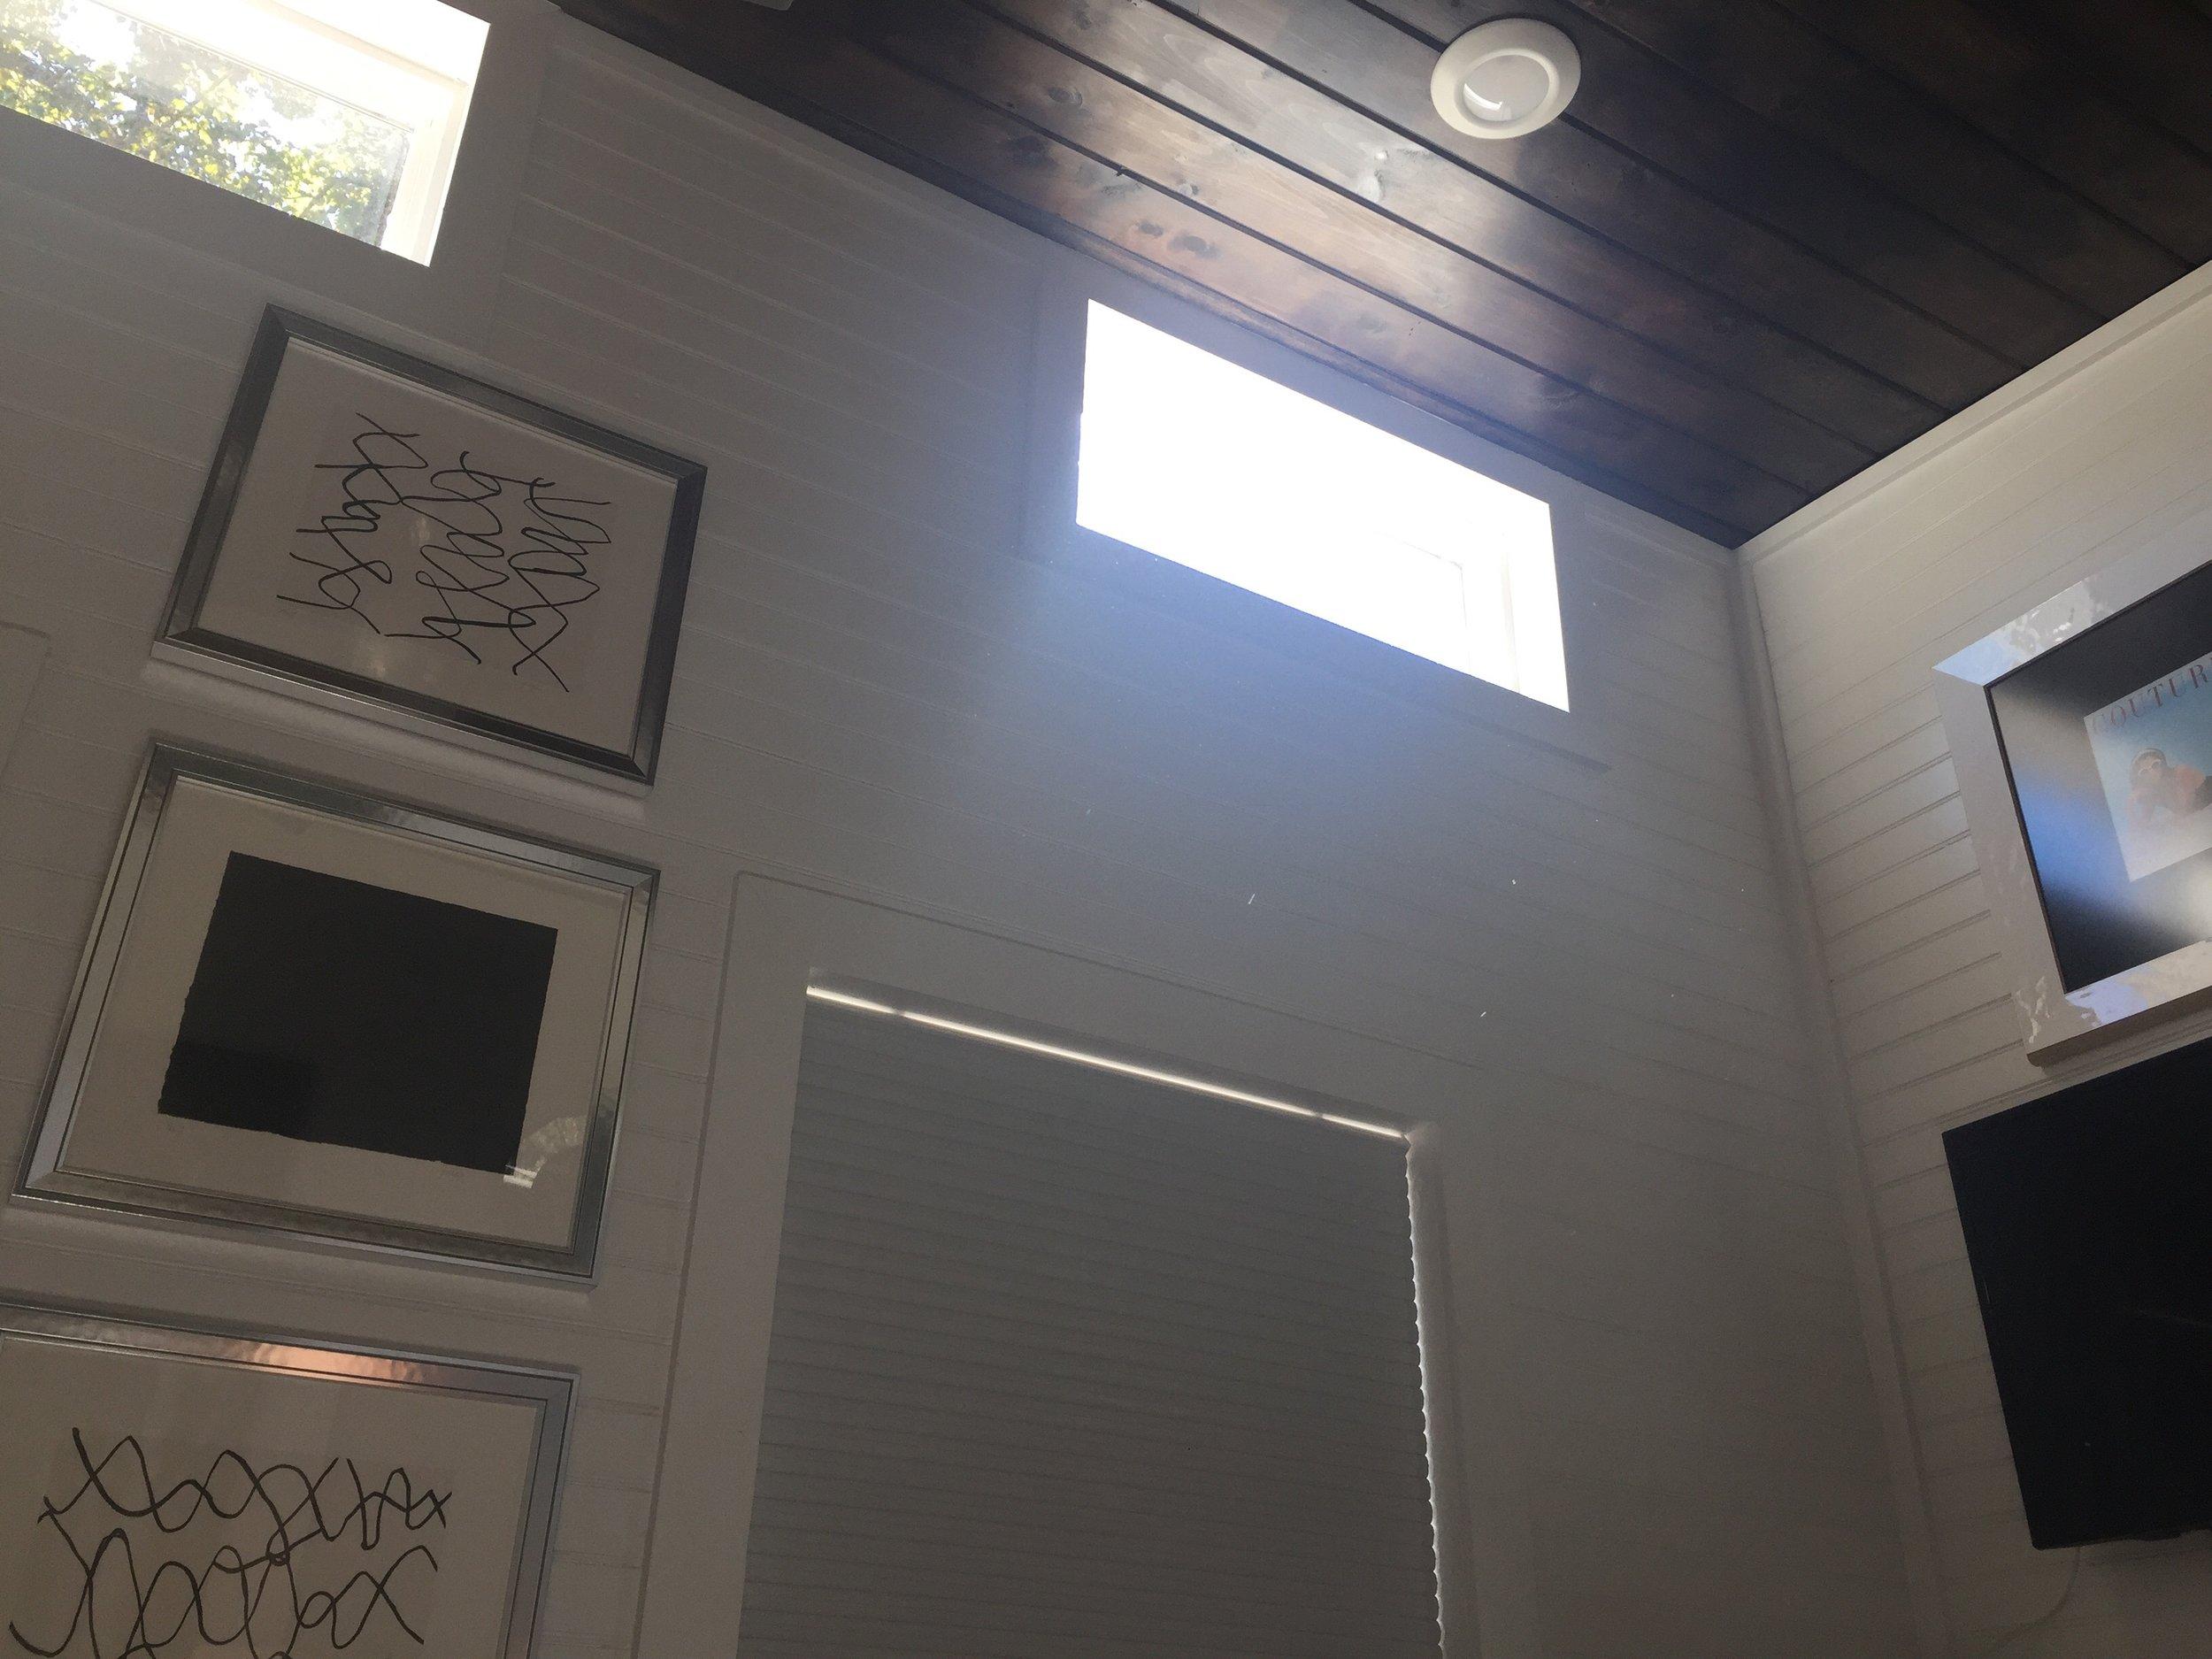 High ceilings make 7.5 feet wide feel a little less cramped